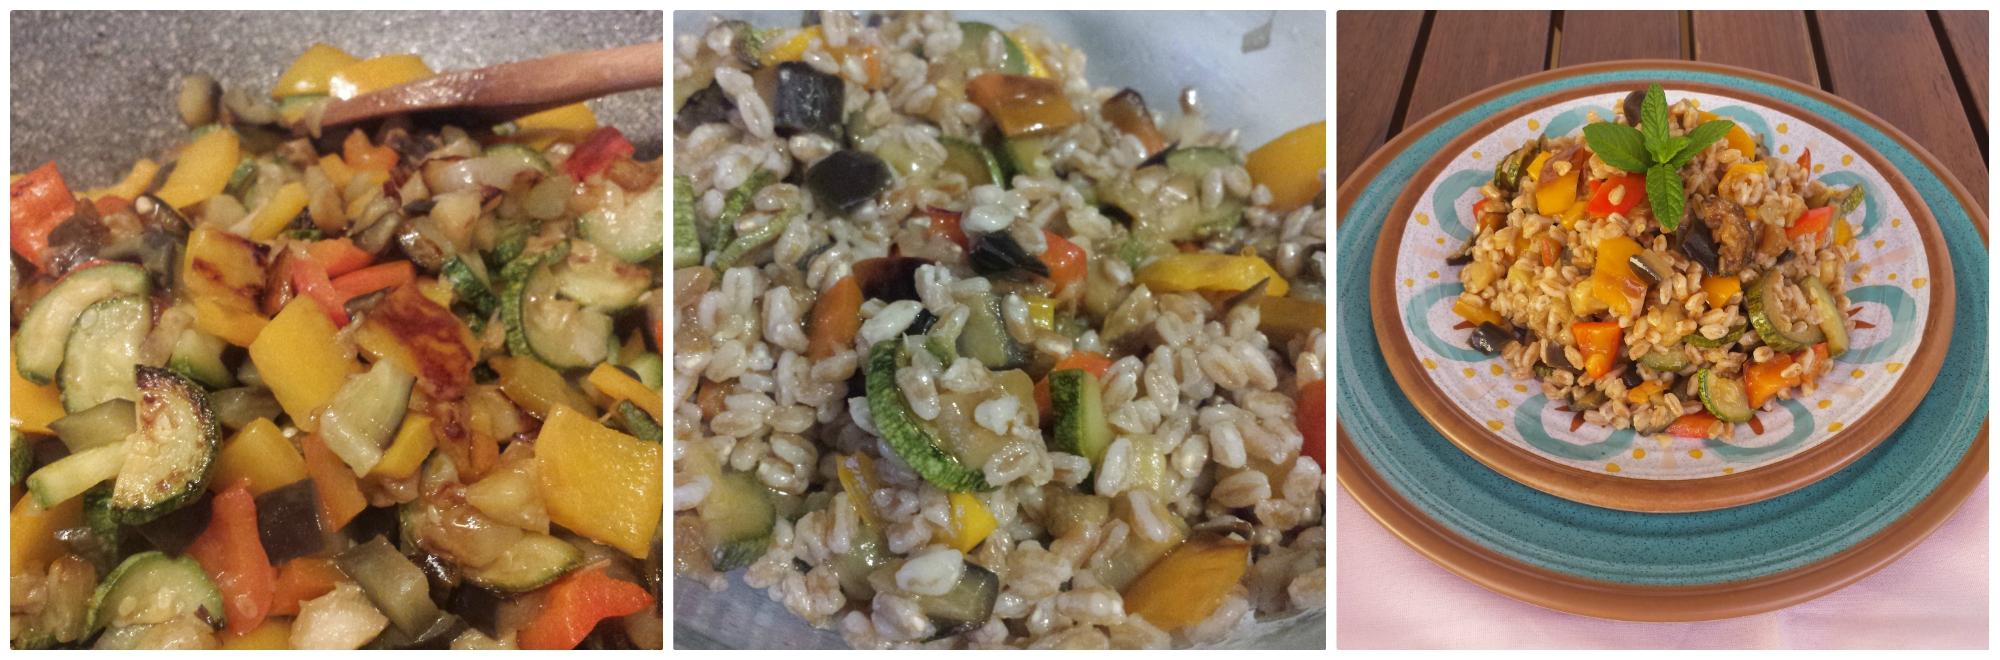 insalata di farro e verdure saltate